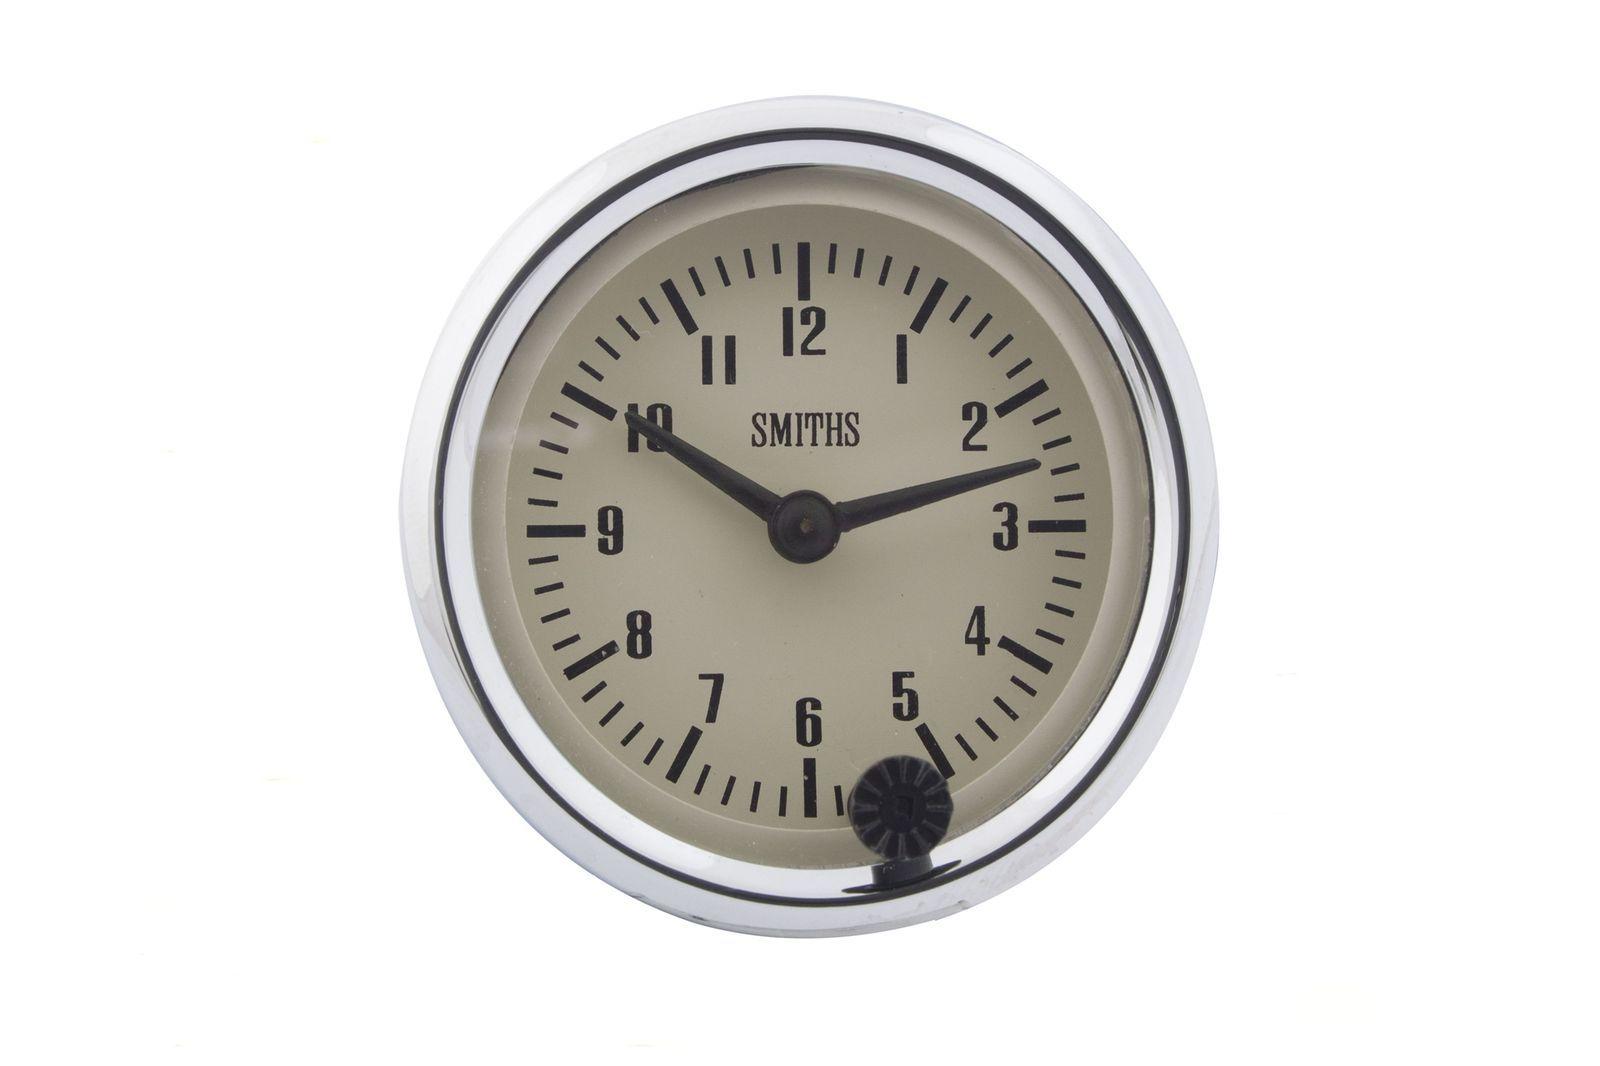 #Zeituhr 52 mm Dia. Helles Ziffernblatt, GAE0128M